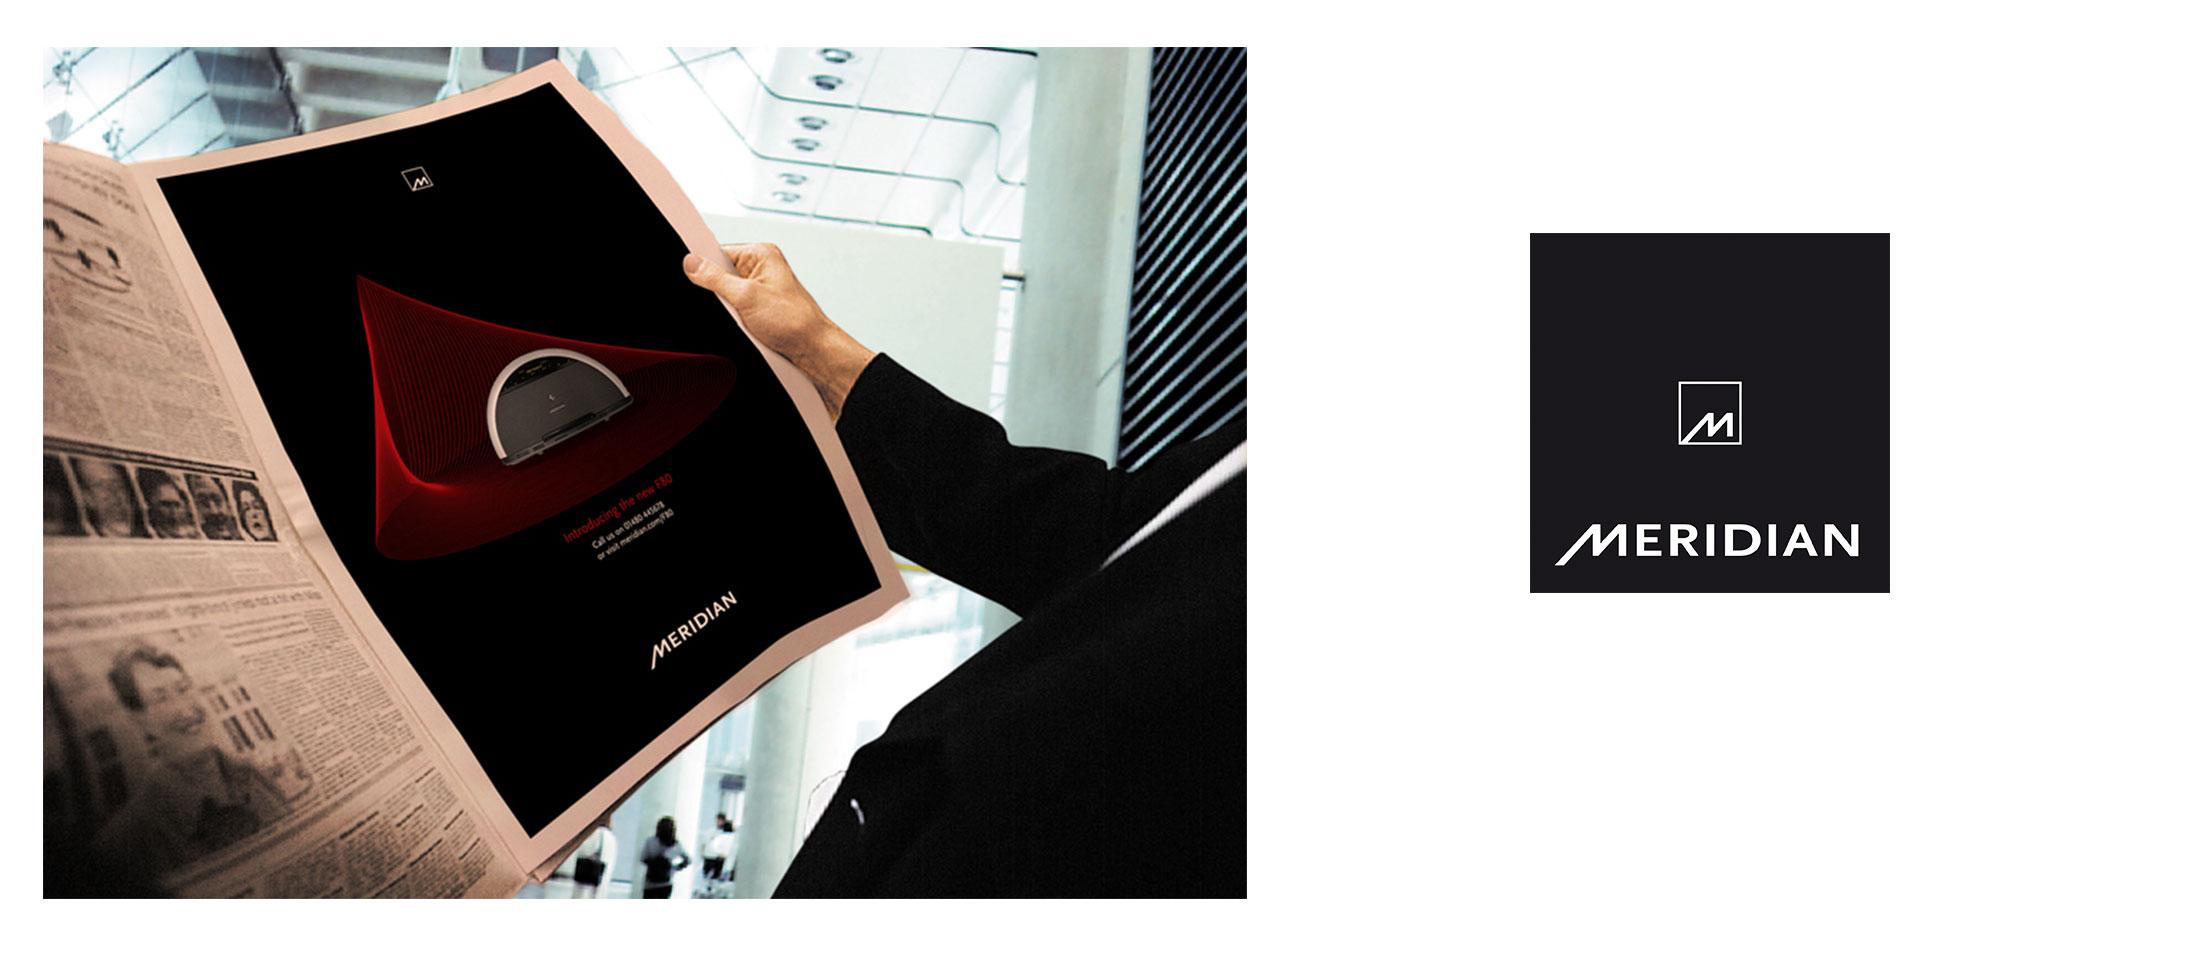 Branding and print advertising design for Meridian Audio